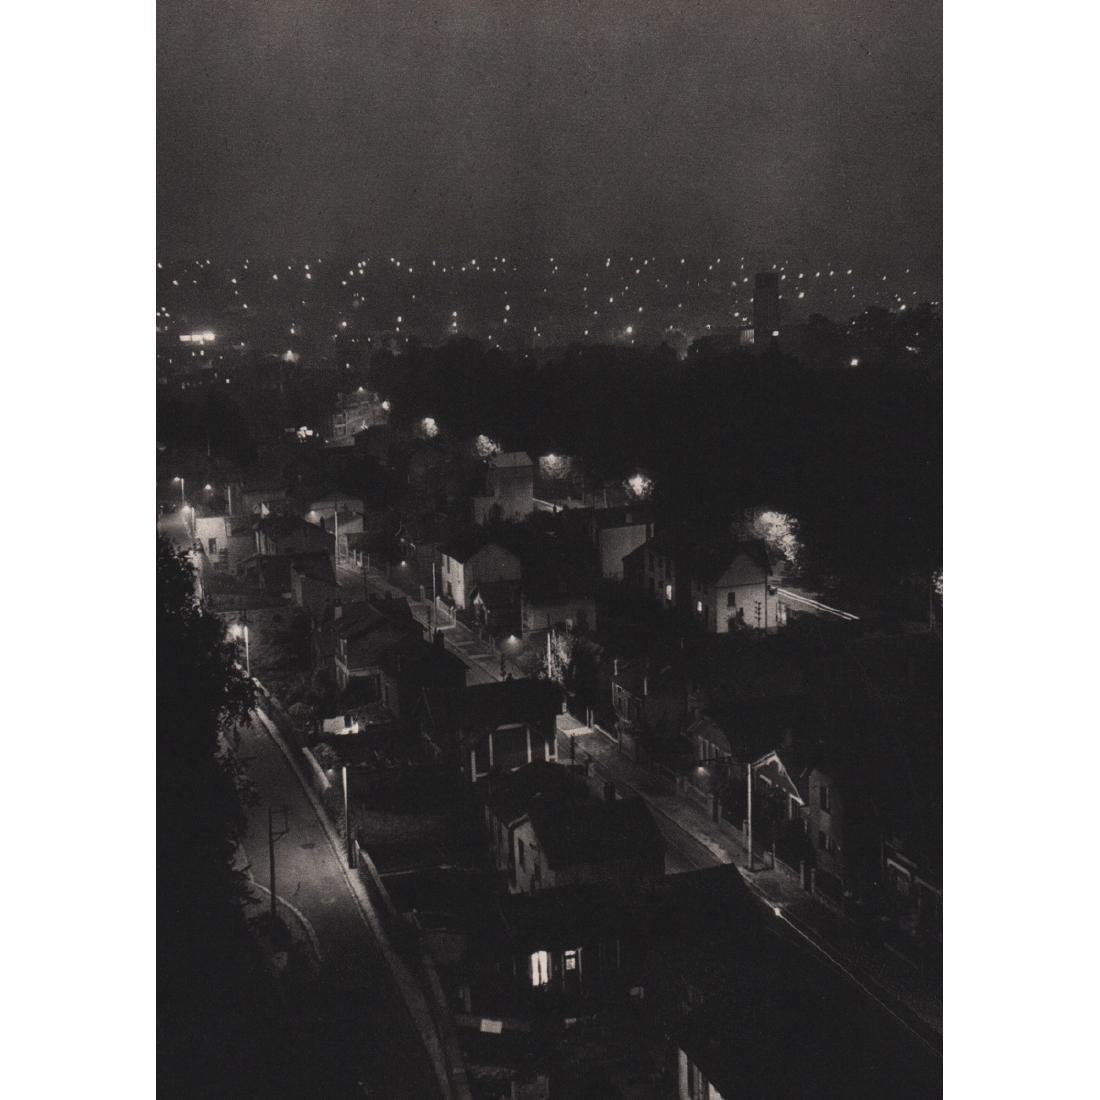 ROBERT DOISNEAU - The Pavilions